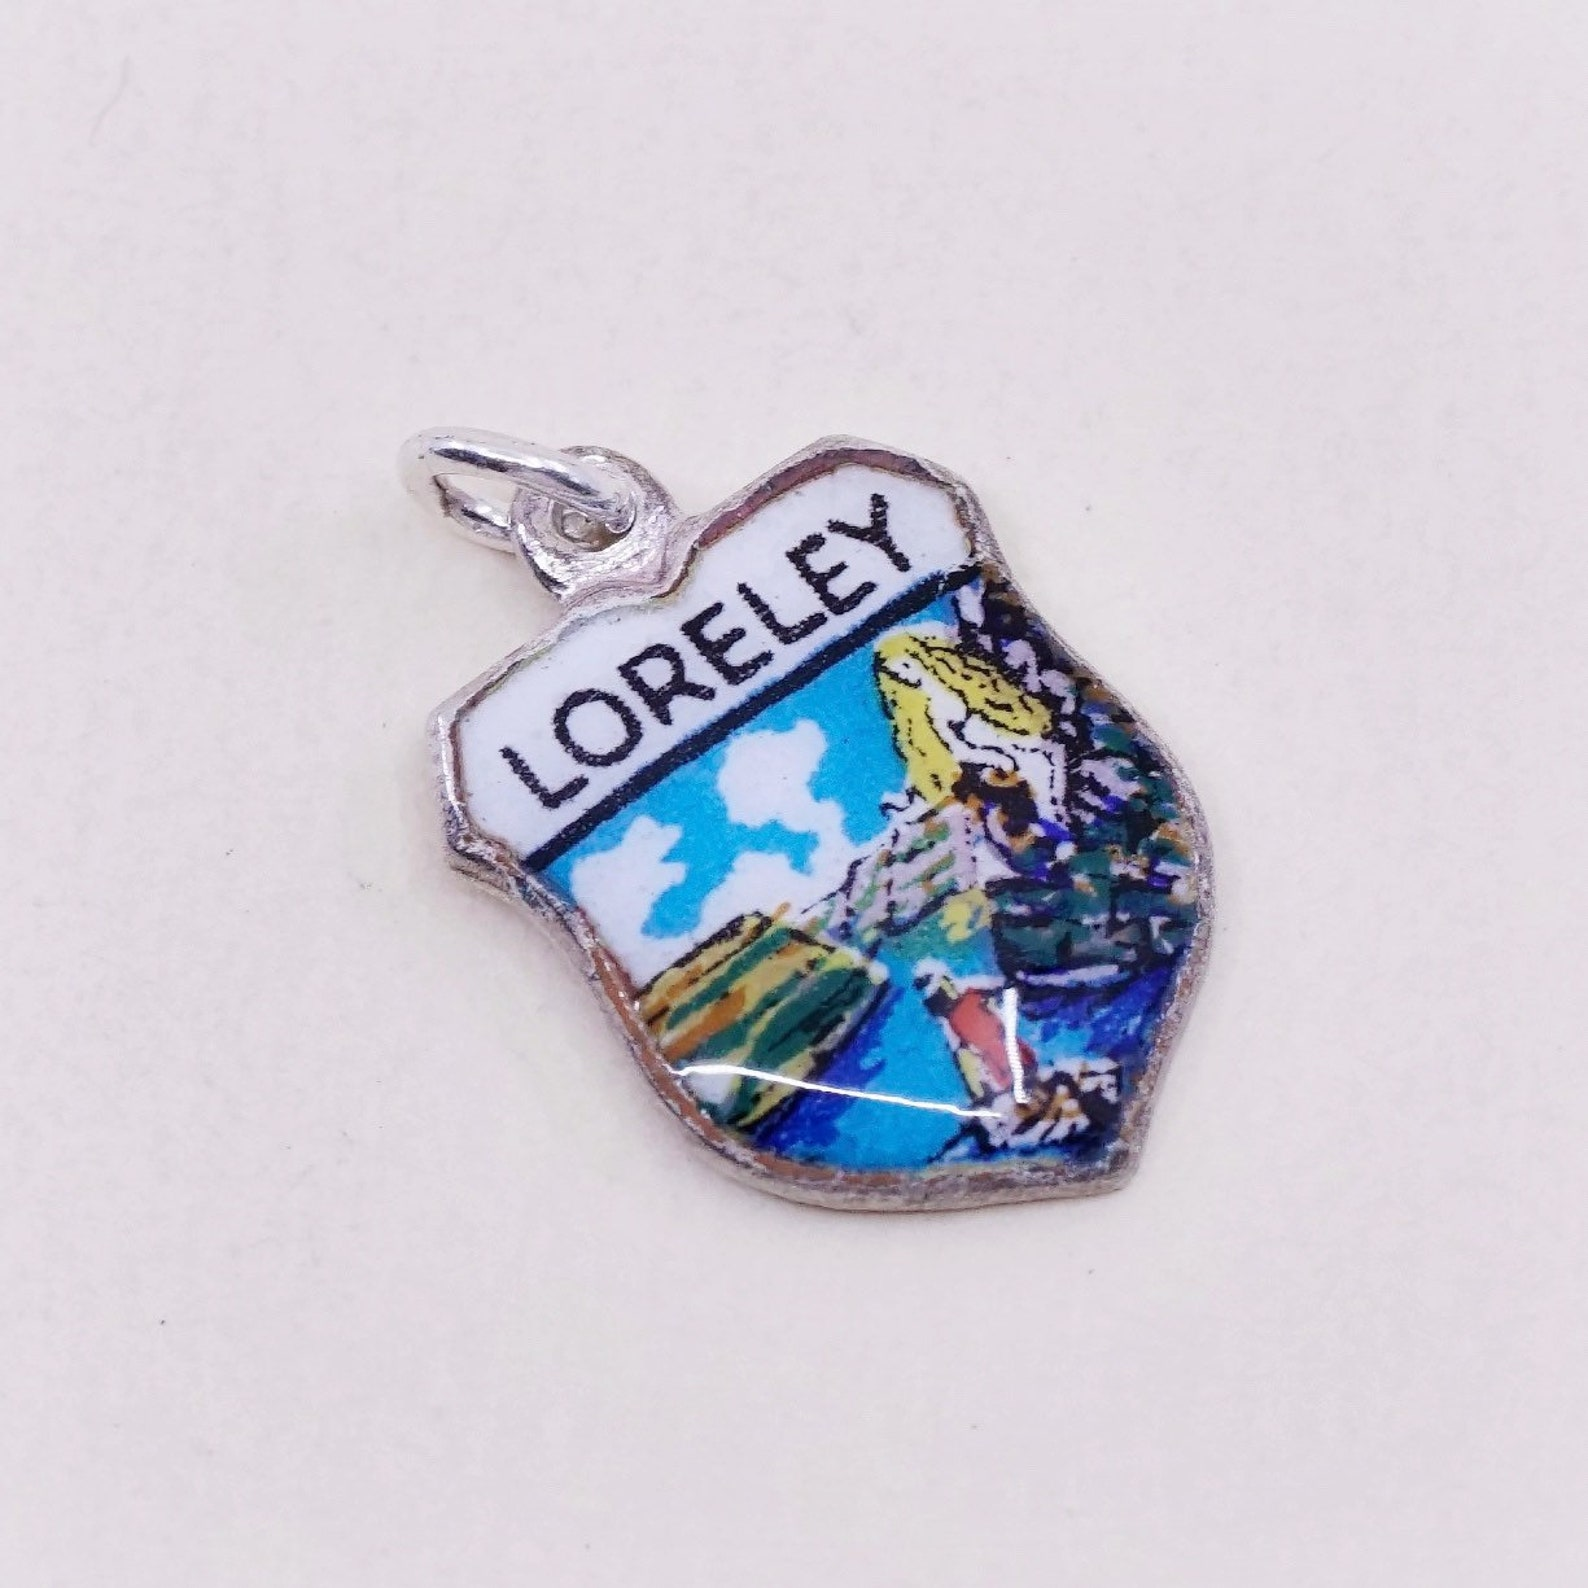 "Vintage Sterling silver handmade pendant, enamel flag charm engraved ""loreley"", stamped 800"